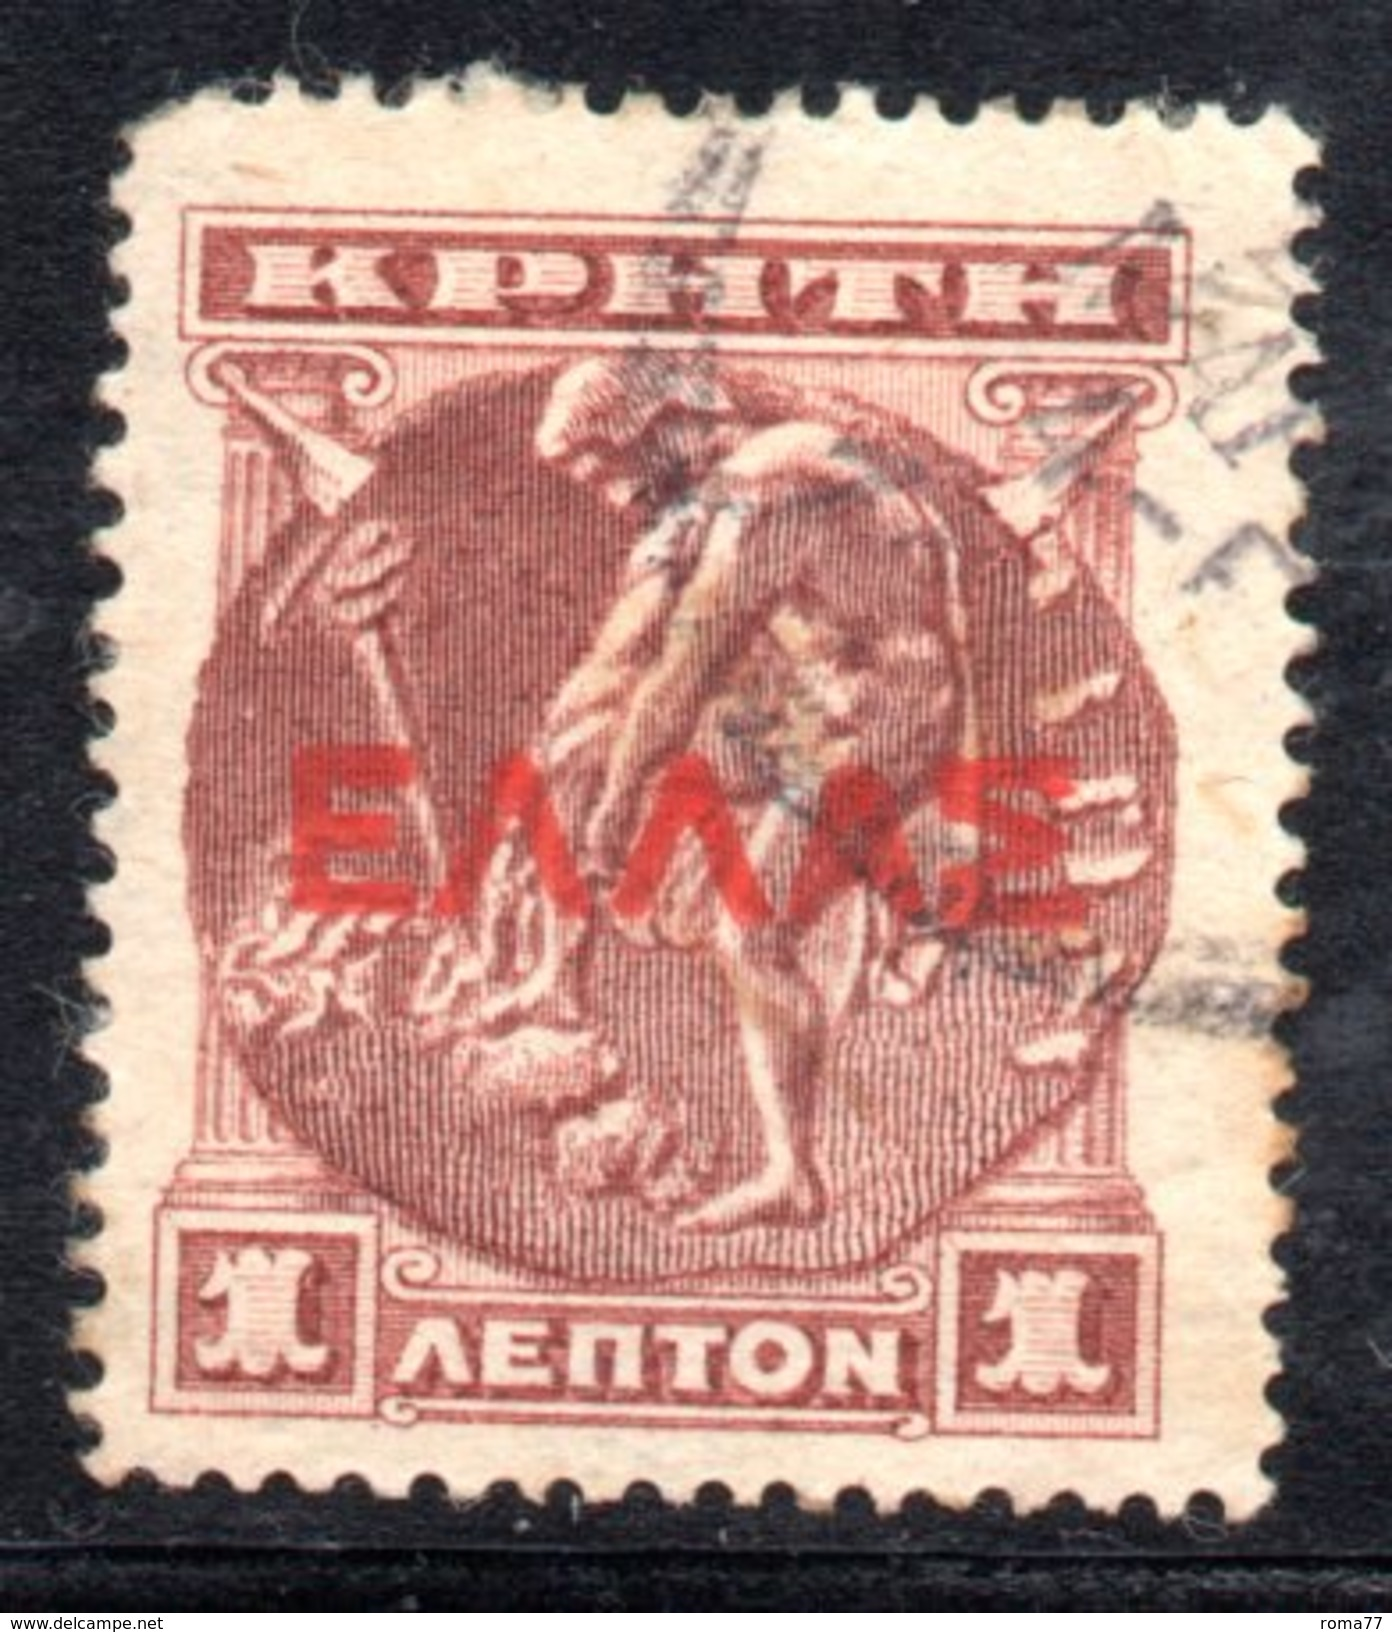 XP2903 - CRETA , 1  Lepton Bruno Rosso  Usato : Soprastampa Rossa - Creta